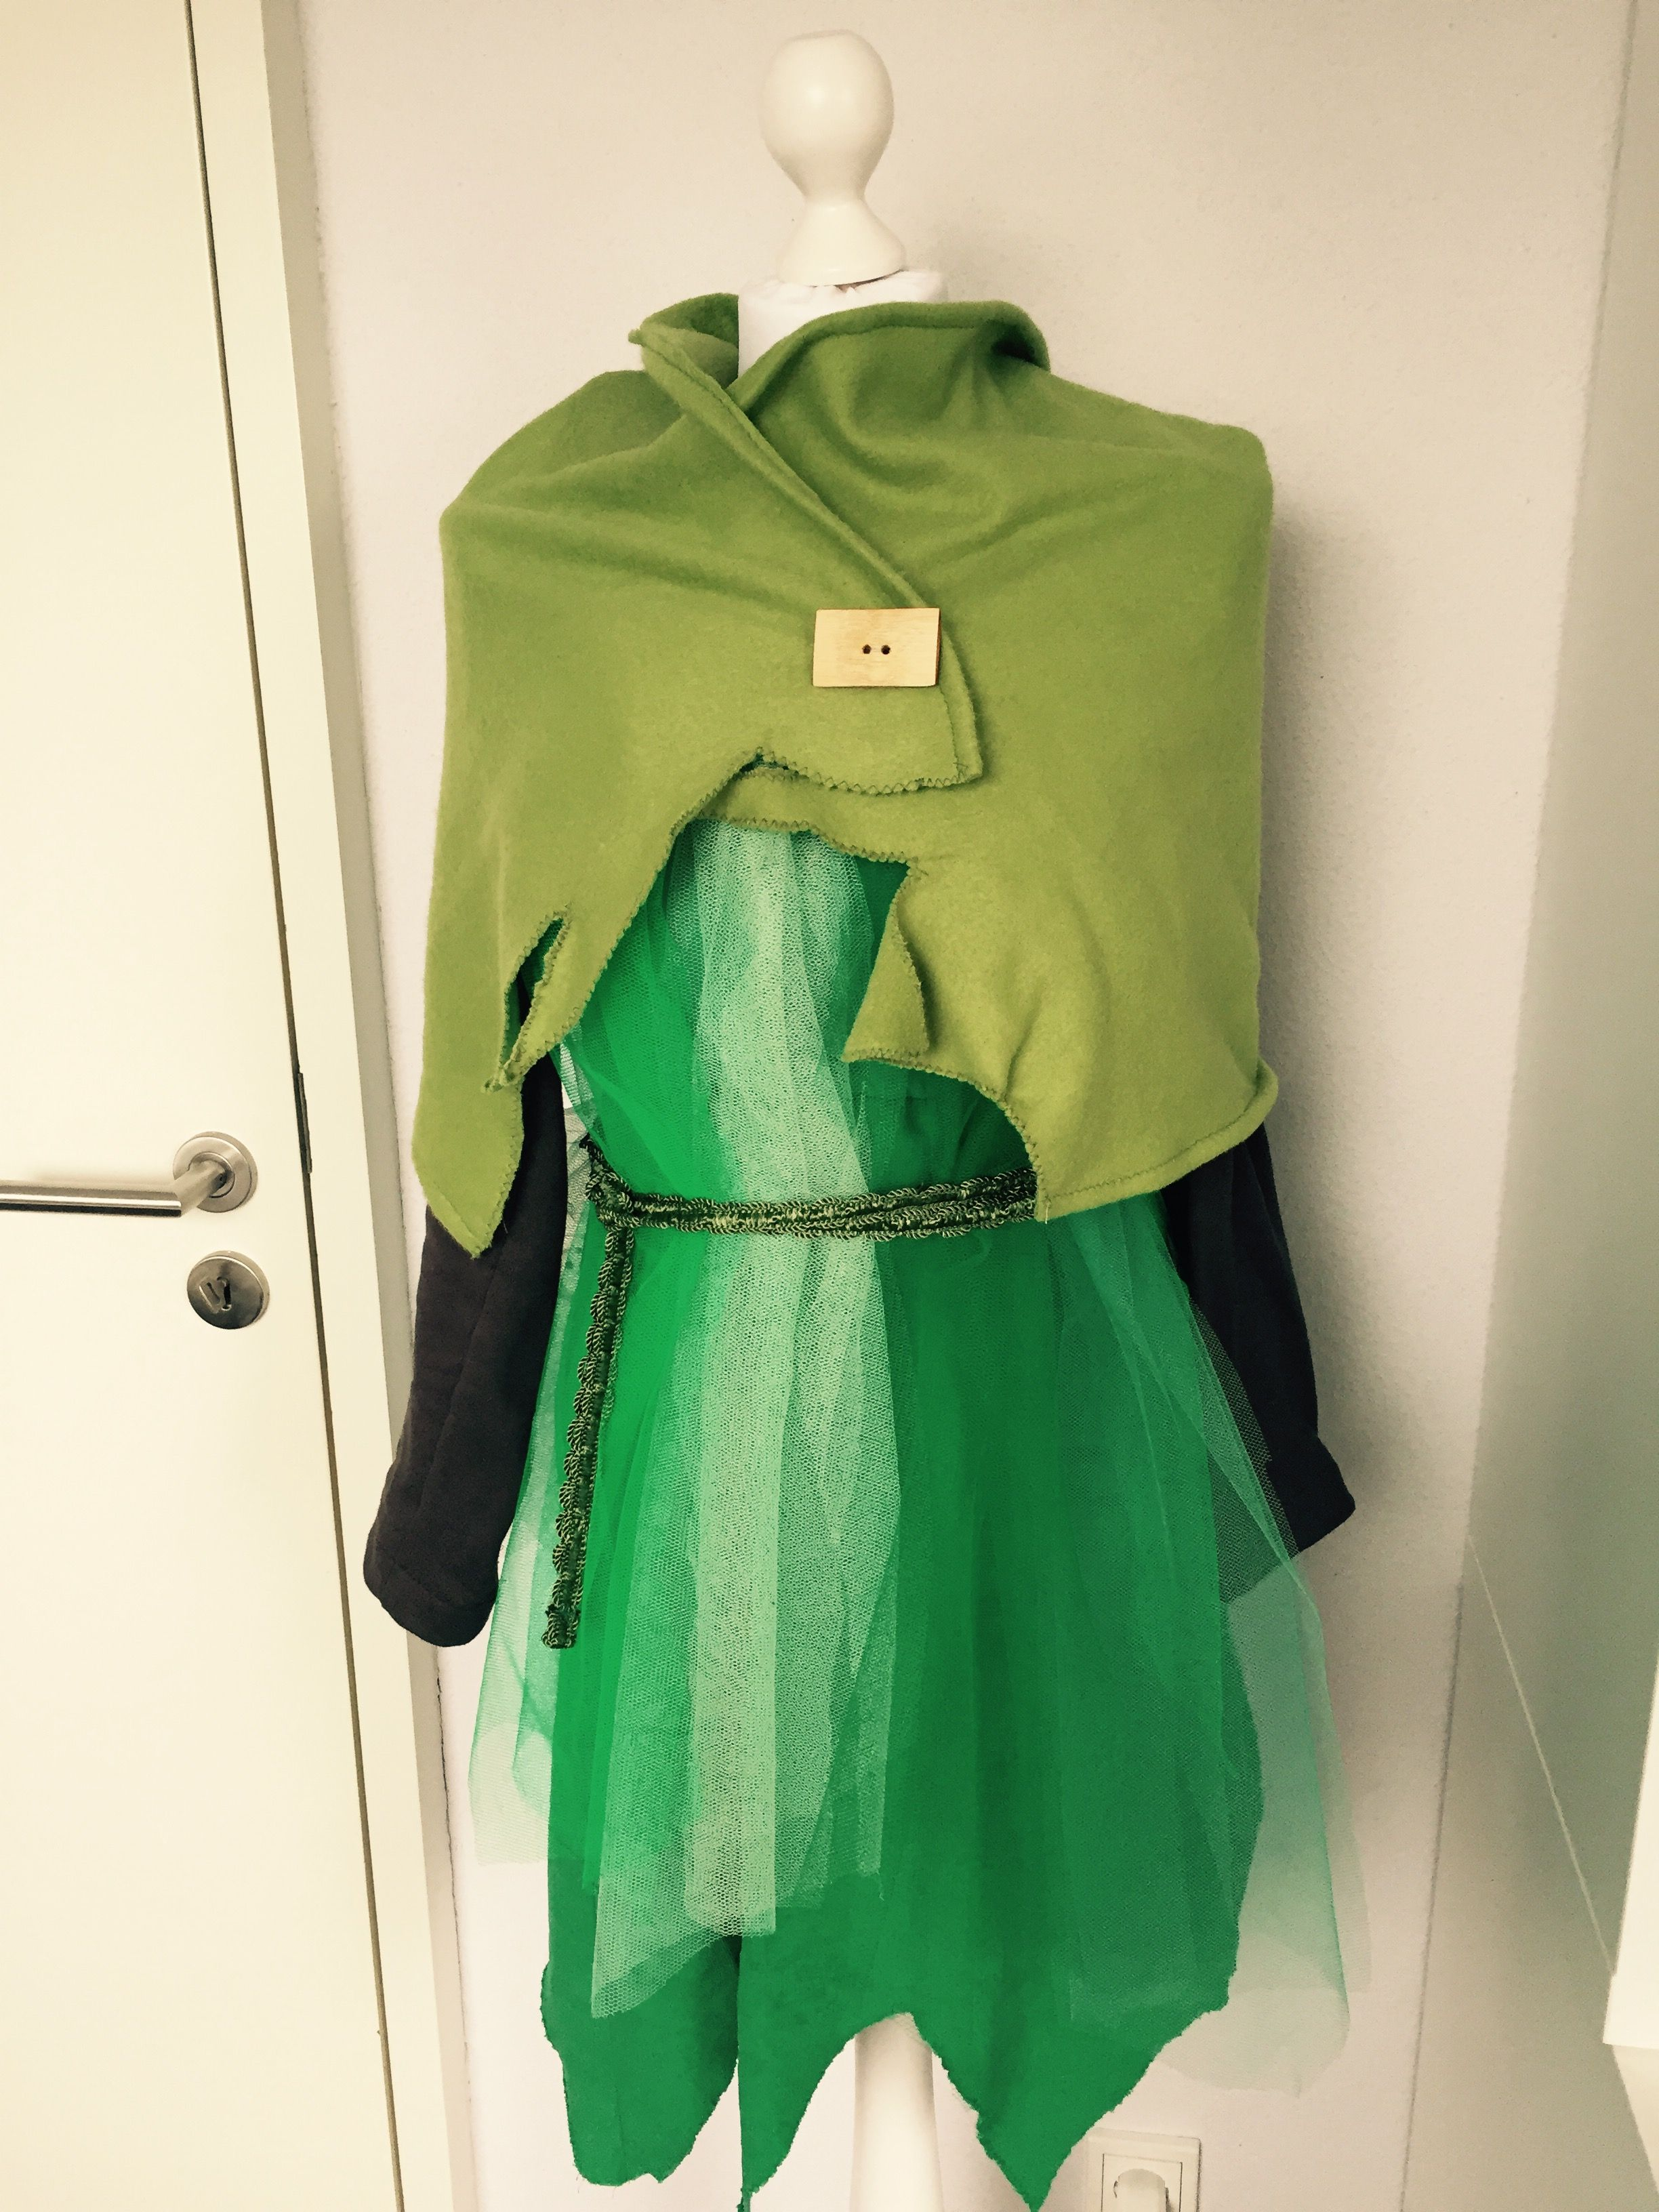 Tinkerbell Kostüm mit Cape   Fasching Kostüm   Pinterest ...